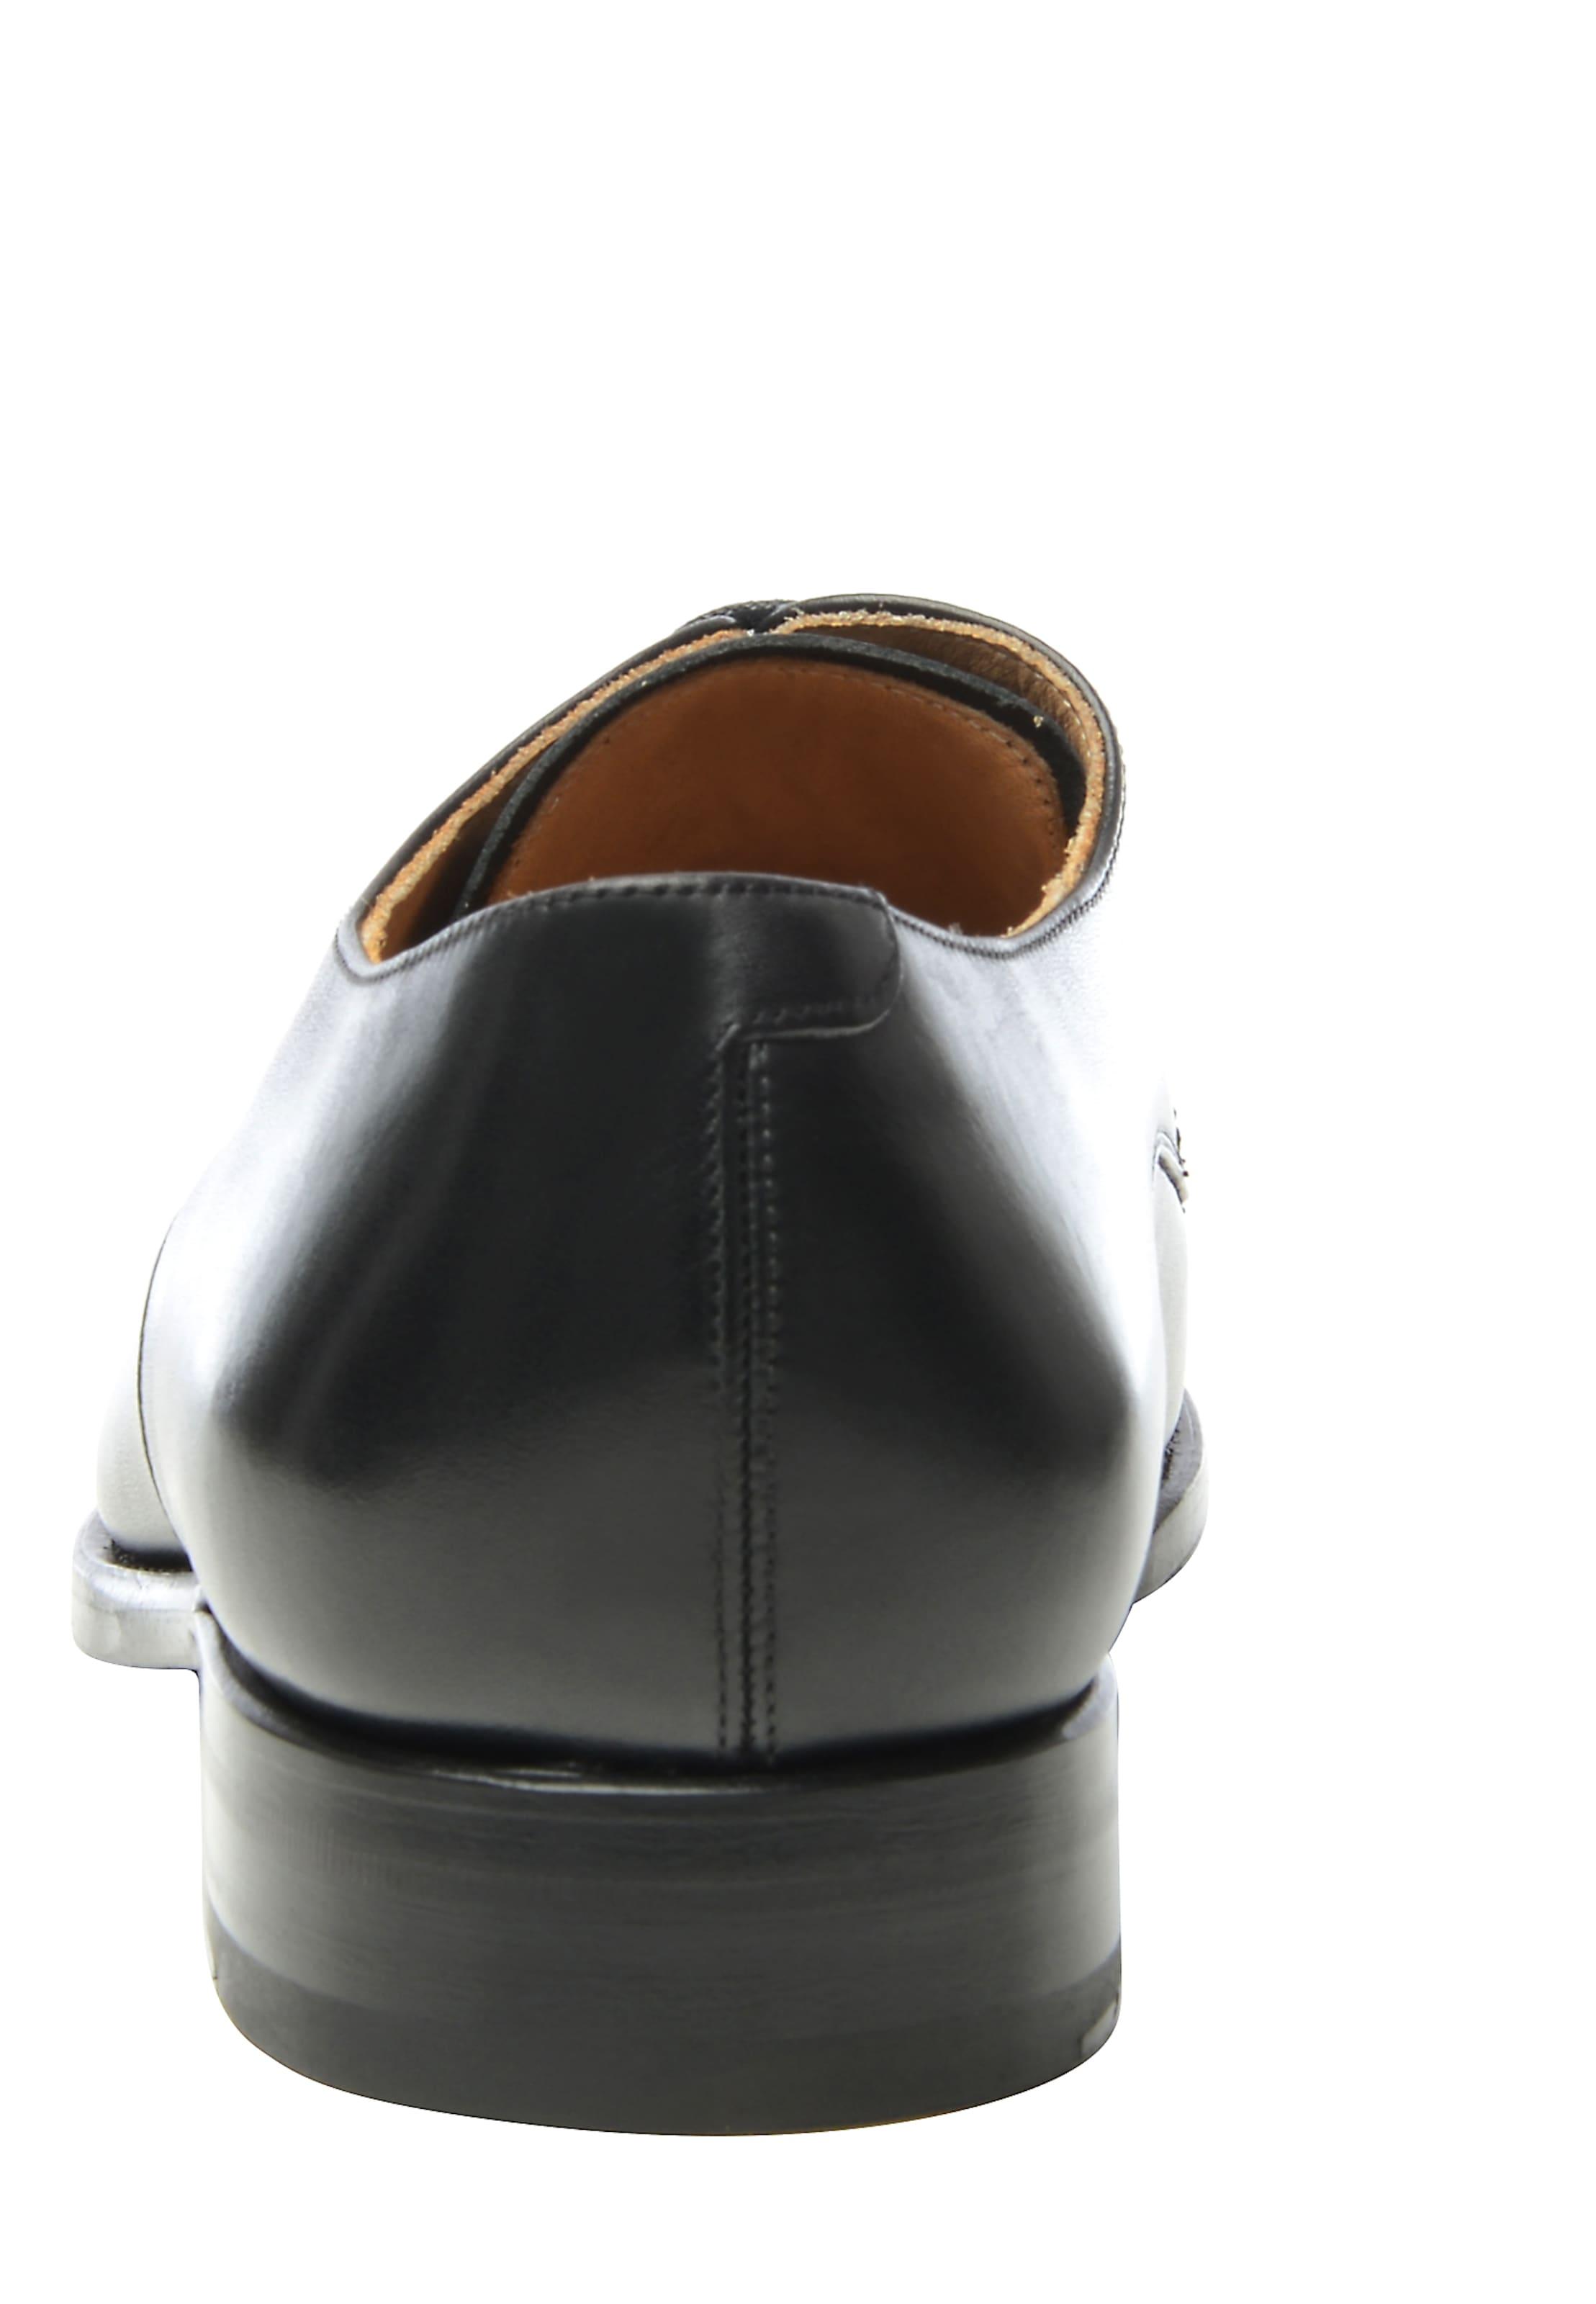 In Businessschuhe Schwarz Shoepassion ' No530 Zn0NX8wOPk